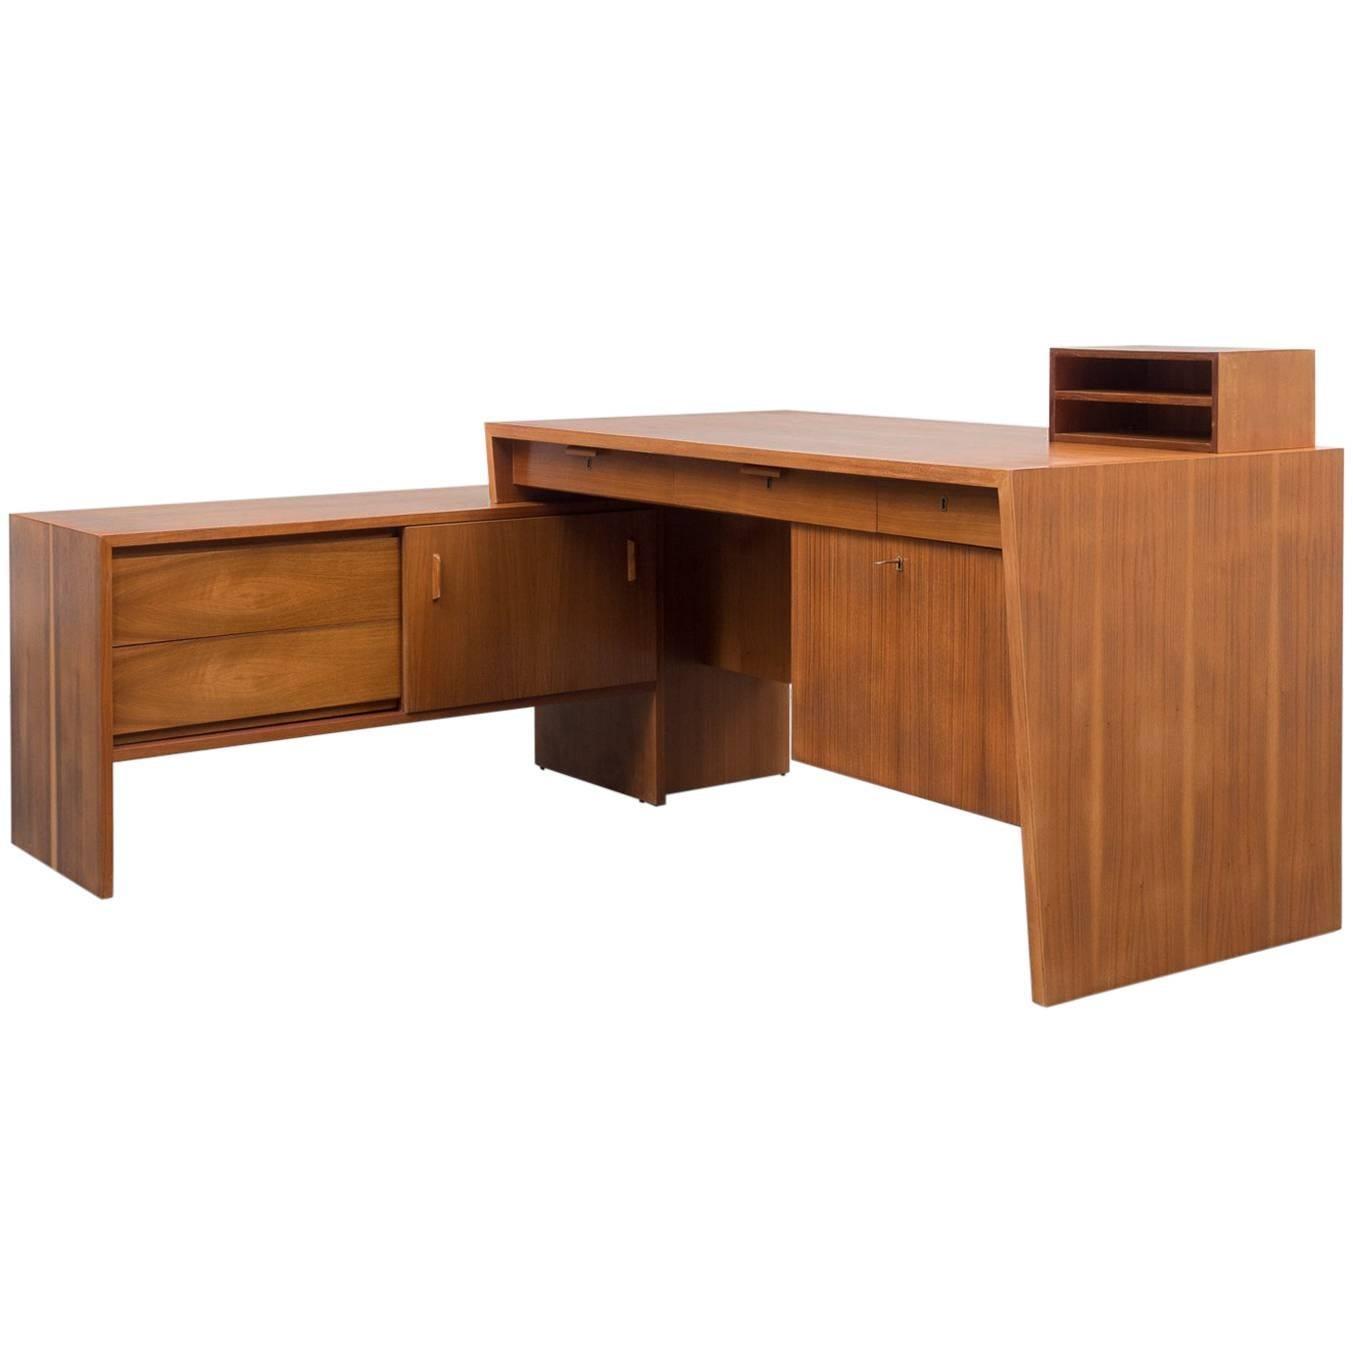 desk from the 1950s walnut lshaped